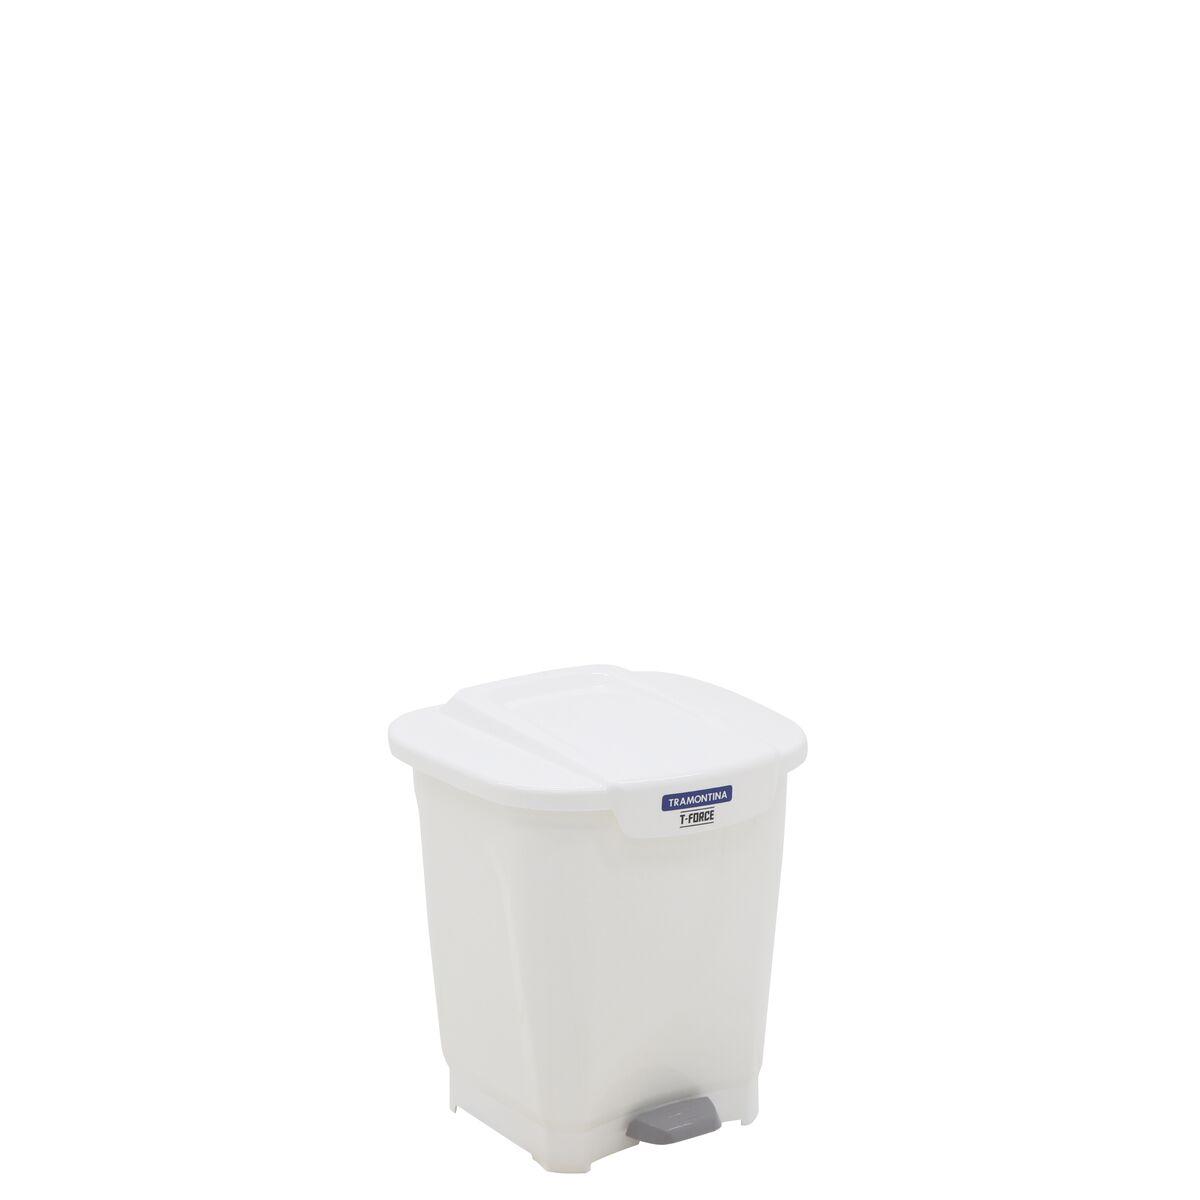 Tramontina T-Force White Polypropylene Trash Can 15L